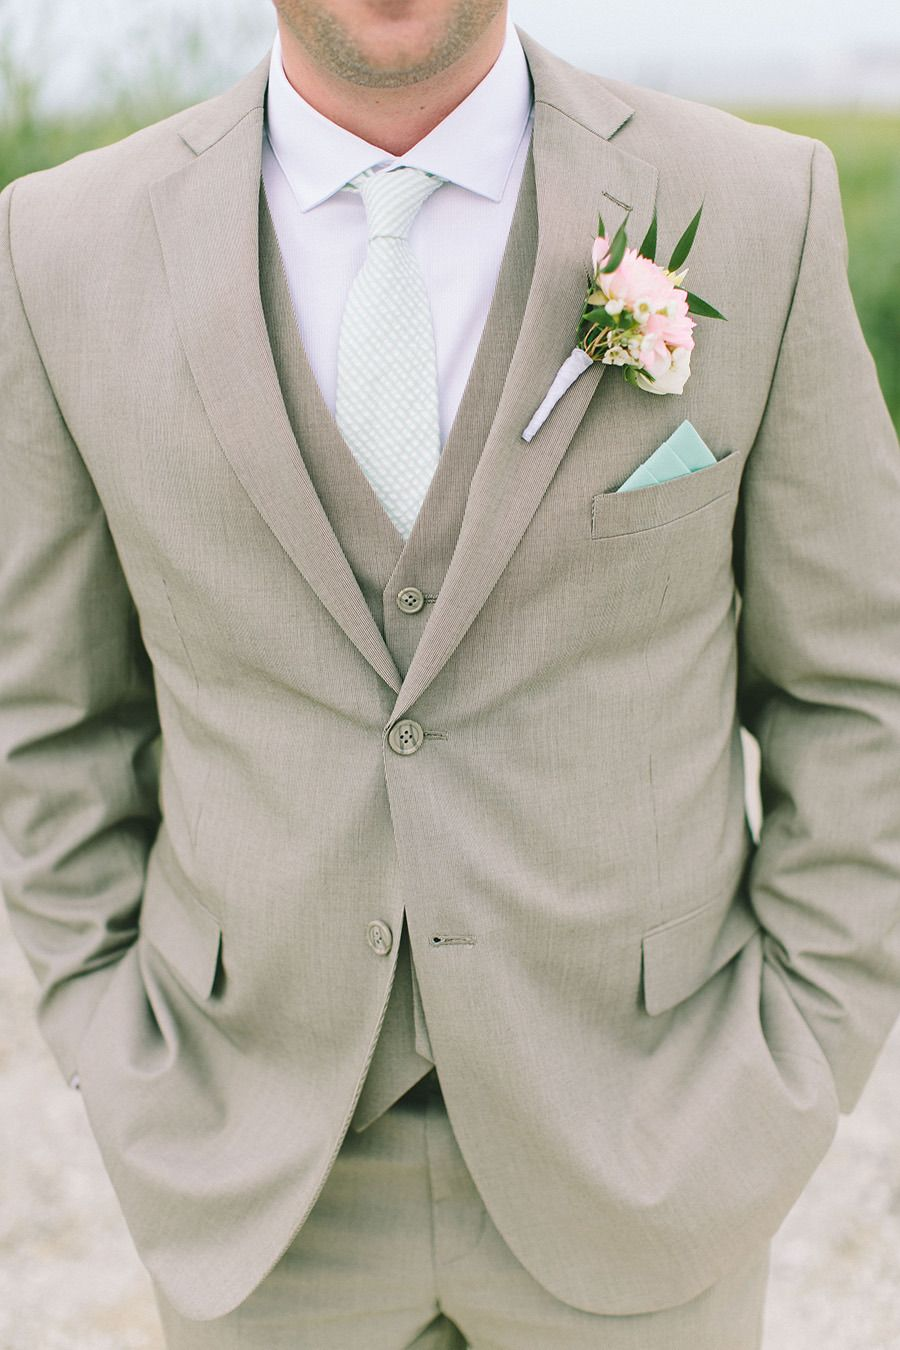 Summer Wedding at Bonnet Island Estate | Wedding, Summer and ...